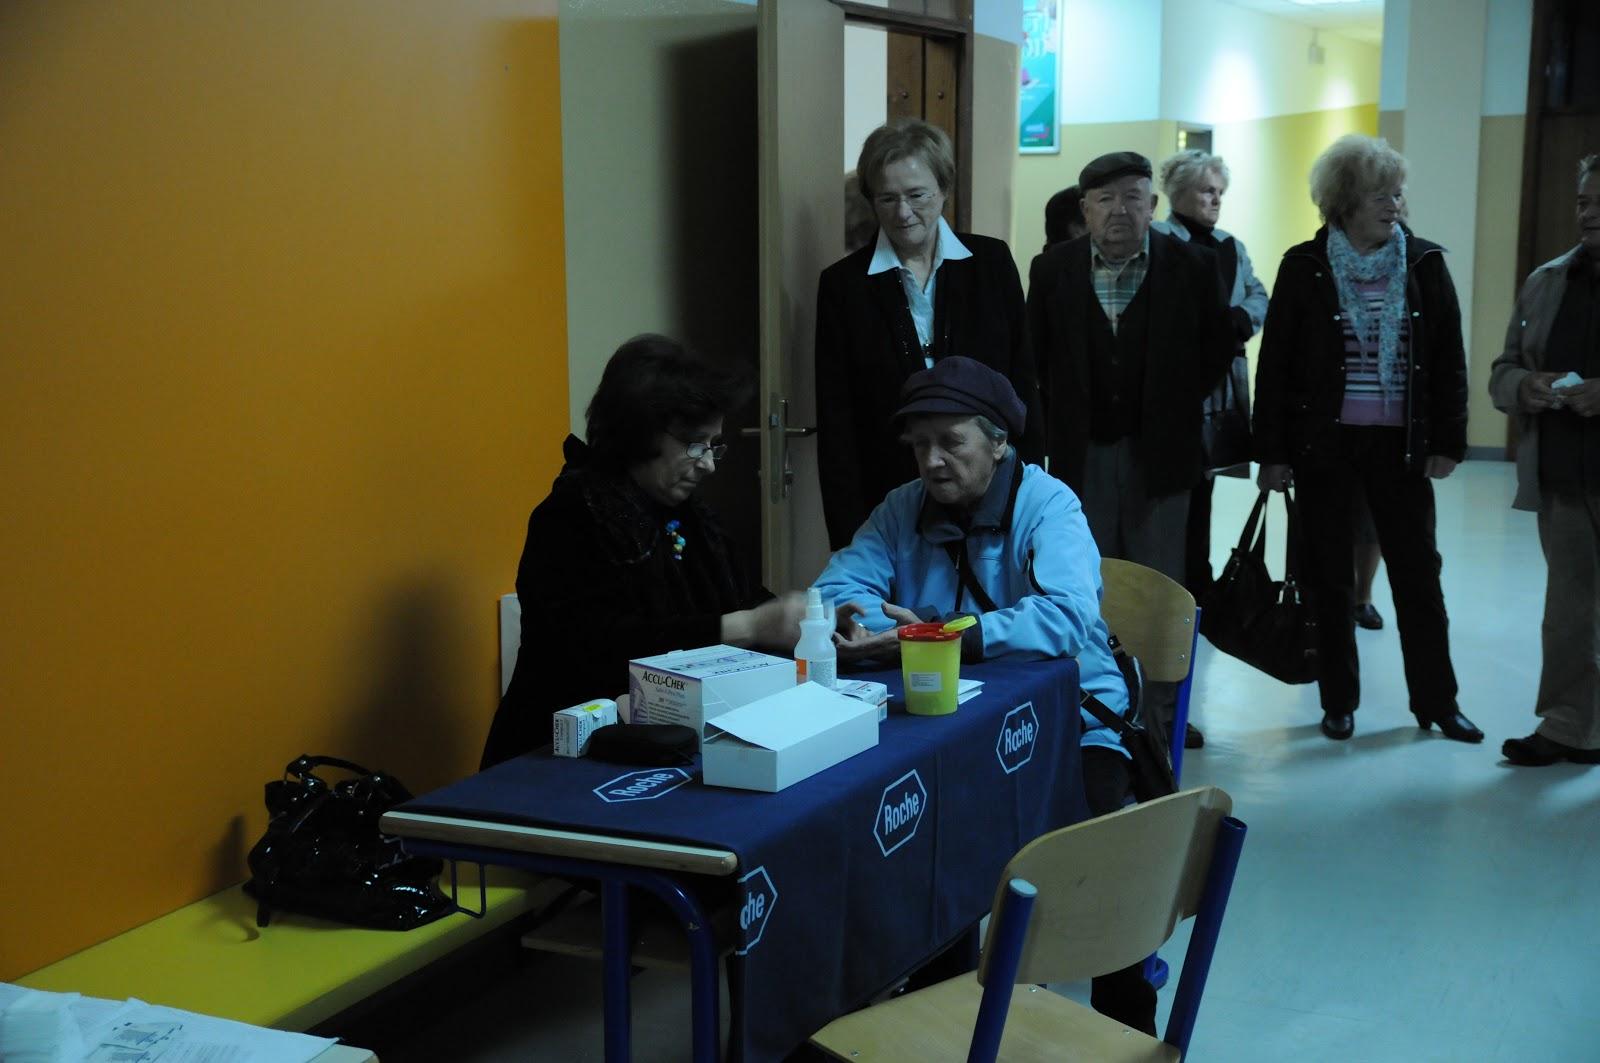 Predavanje, dr. Camlek - oktober 2011 - DSC_3841.JPG